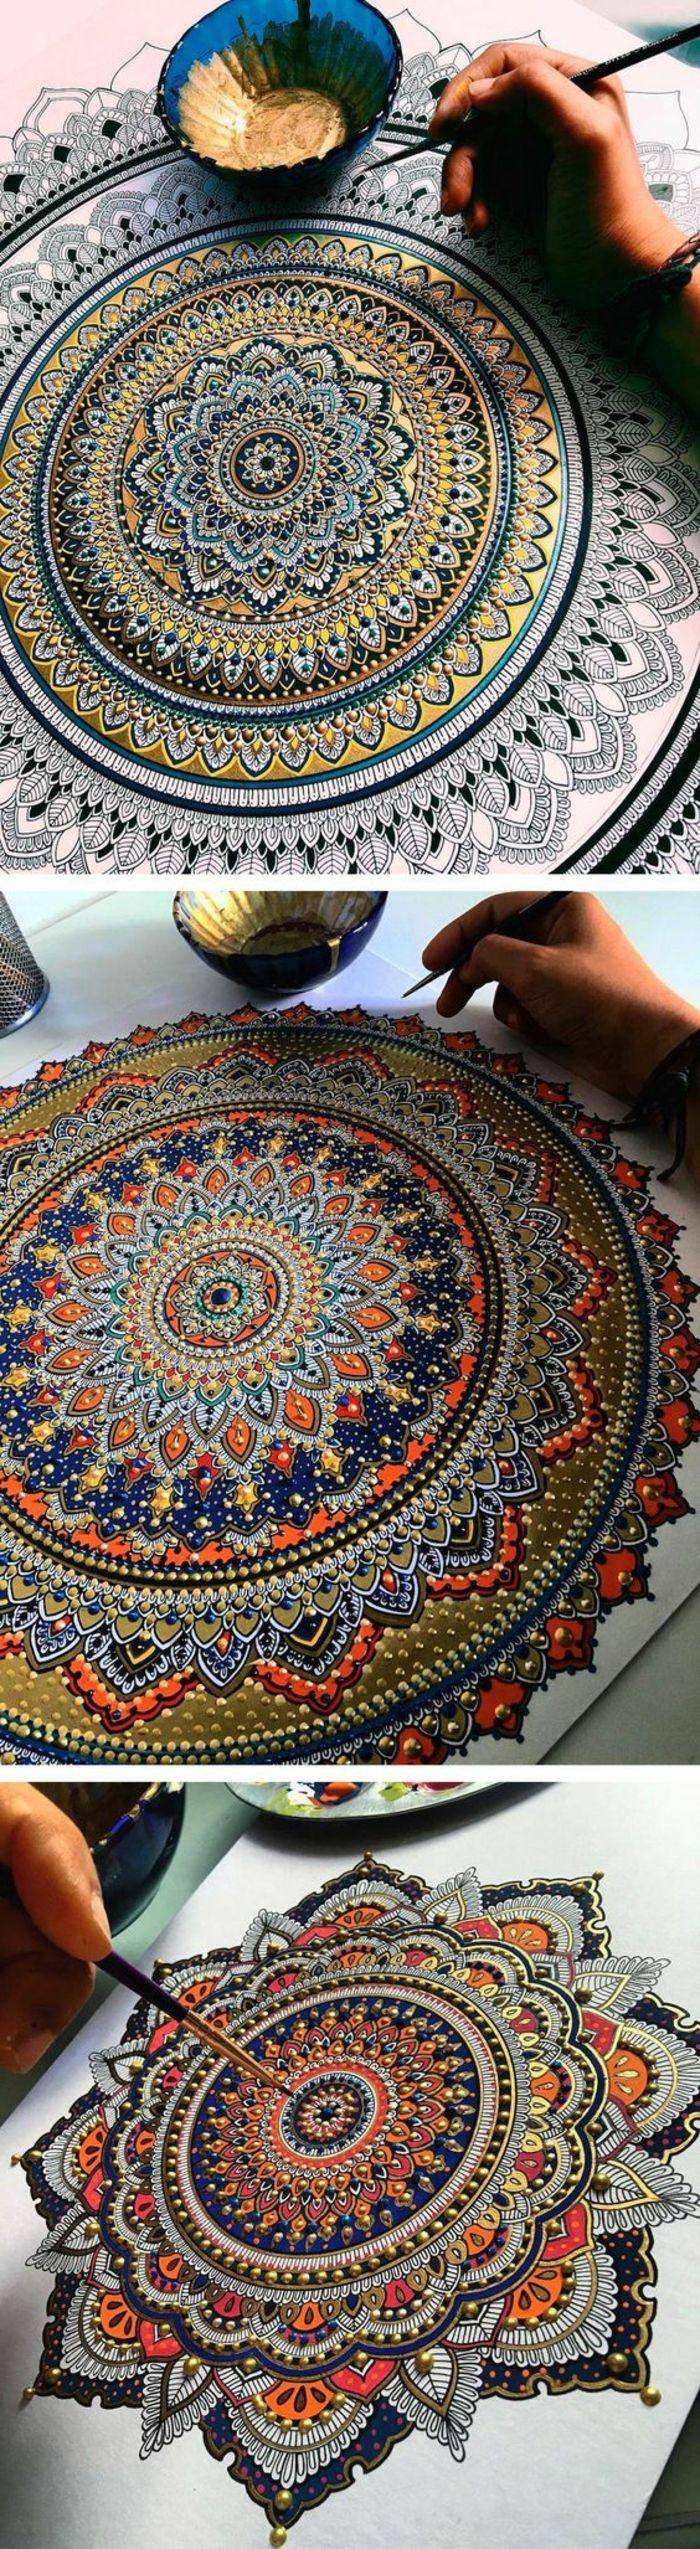 coloriage mandala motifs floraux pinceau papier blanc main bol bleu